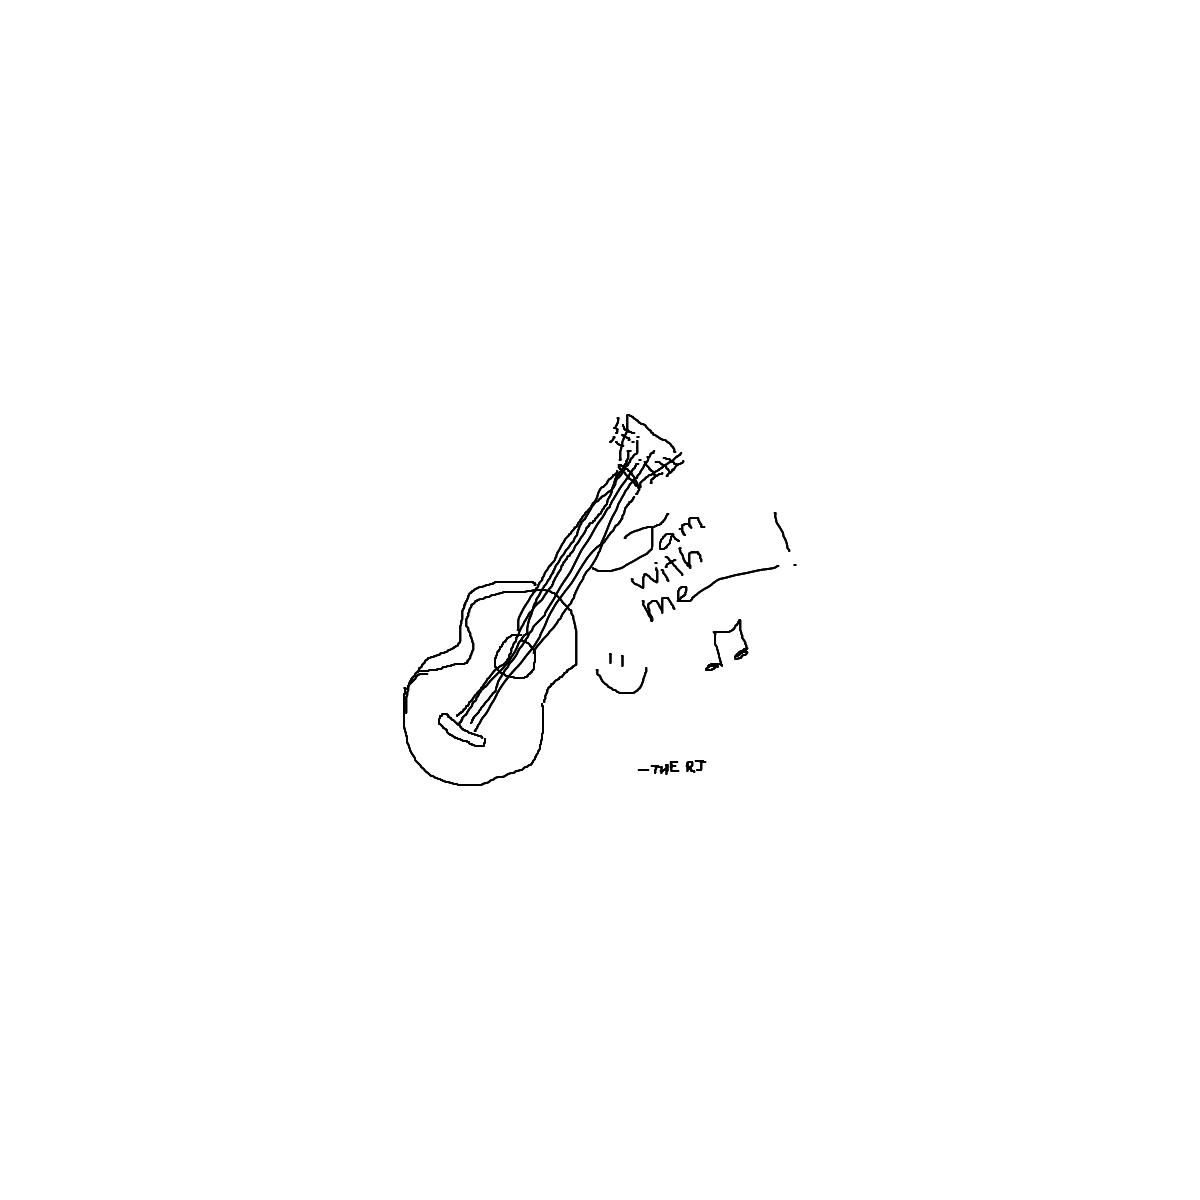 BAAAM drawing#8347 lat:1.4143983125686646lng: 110.3338394165039000